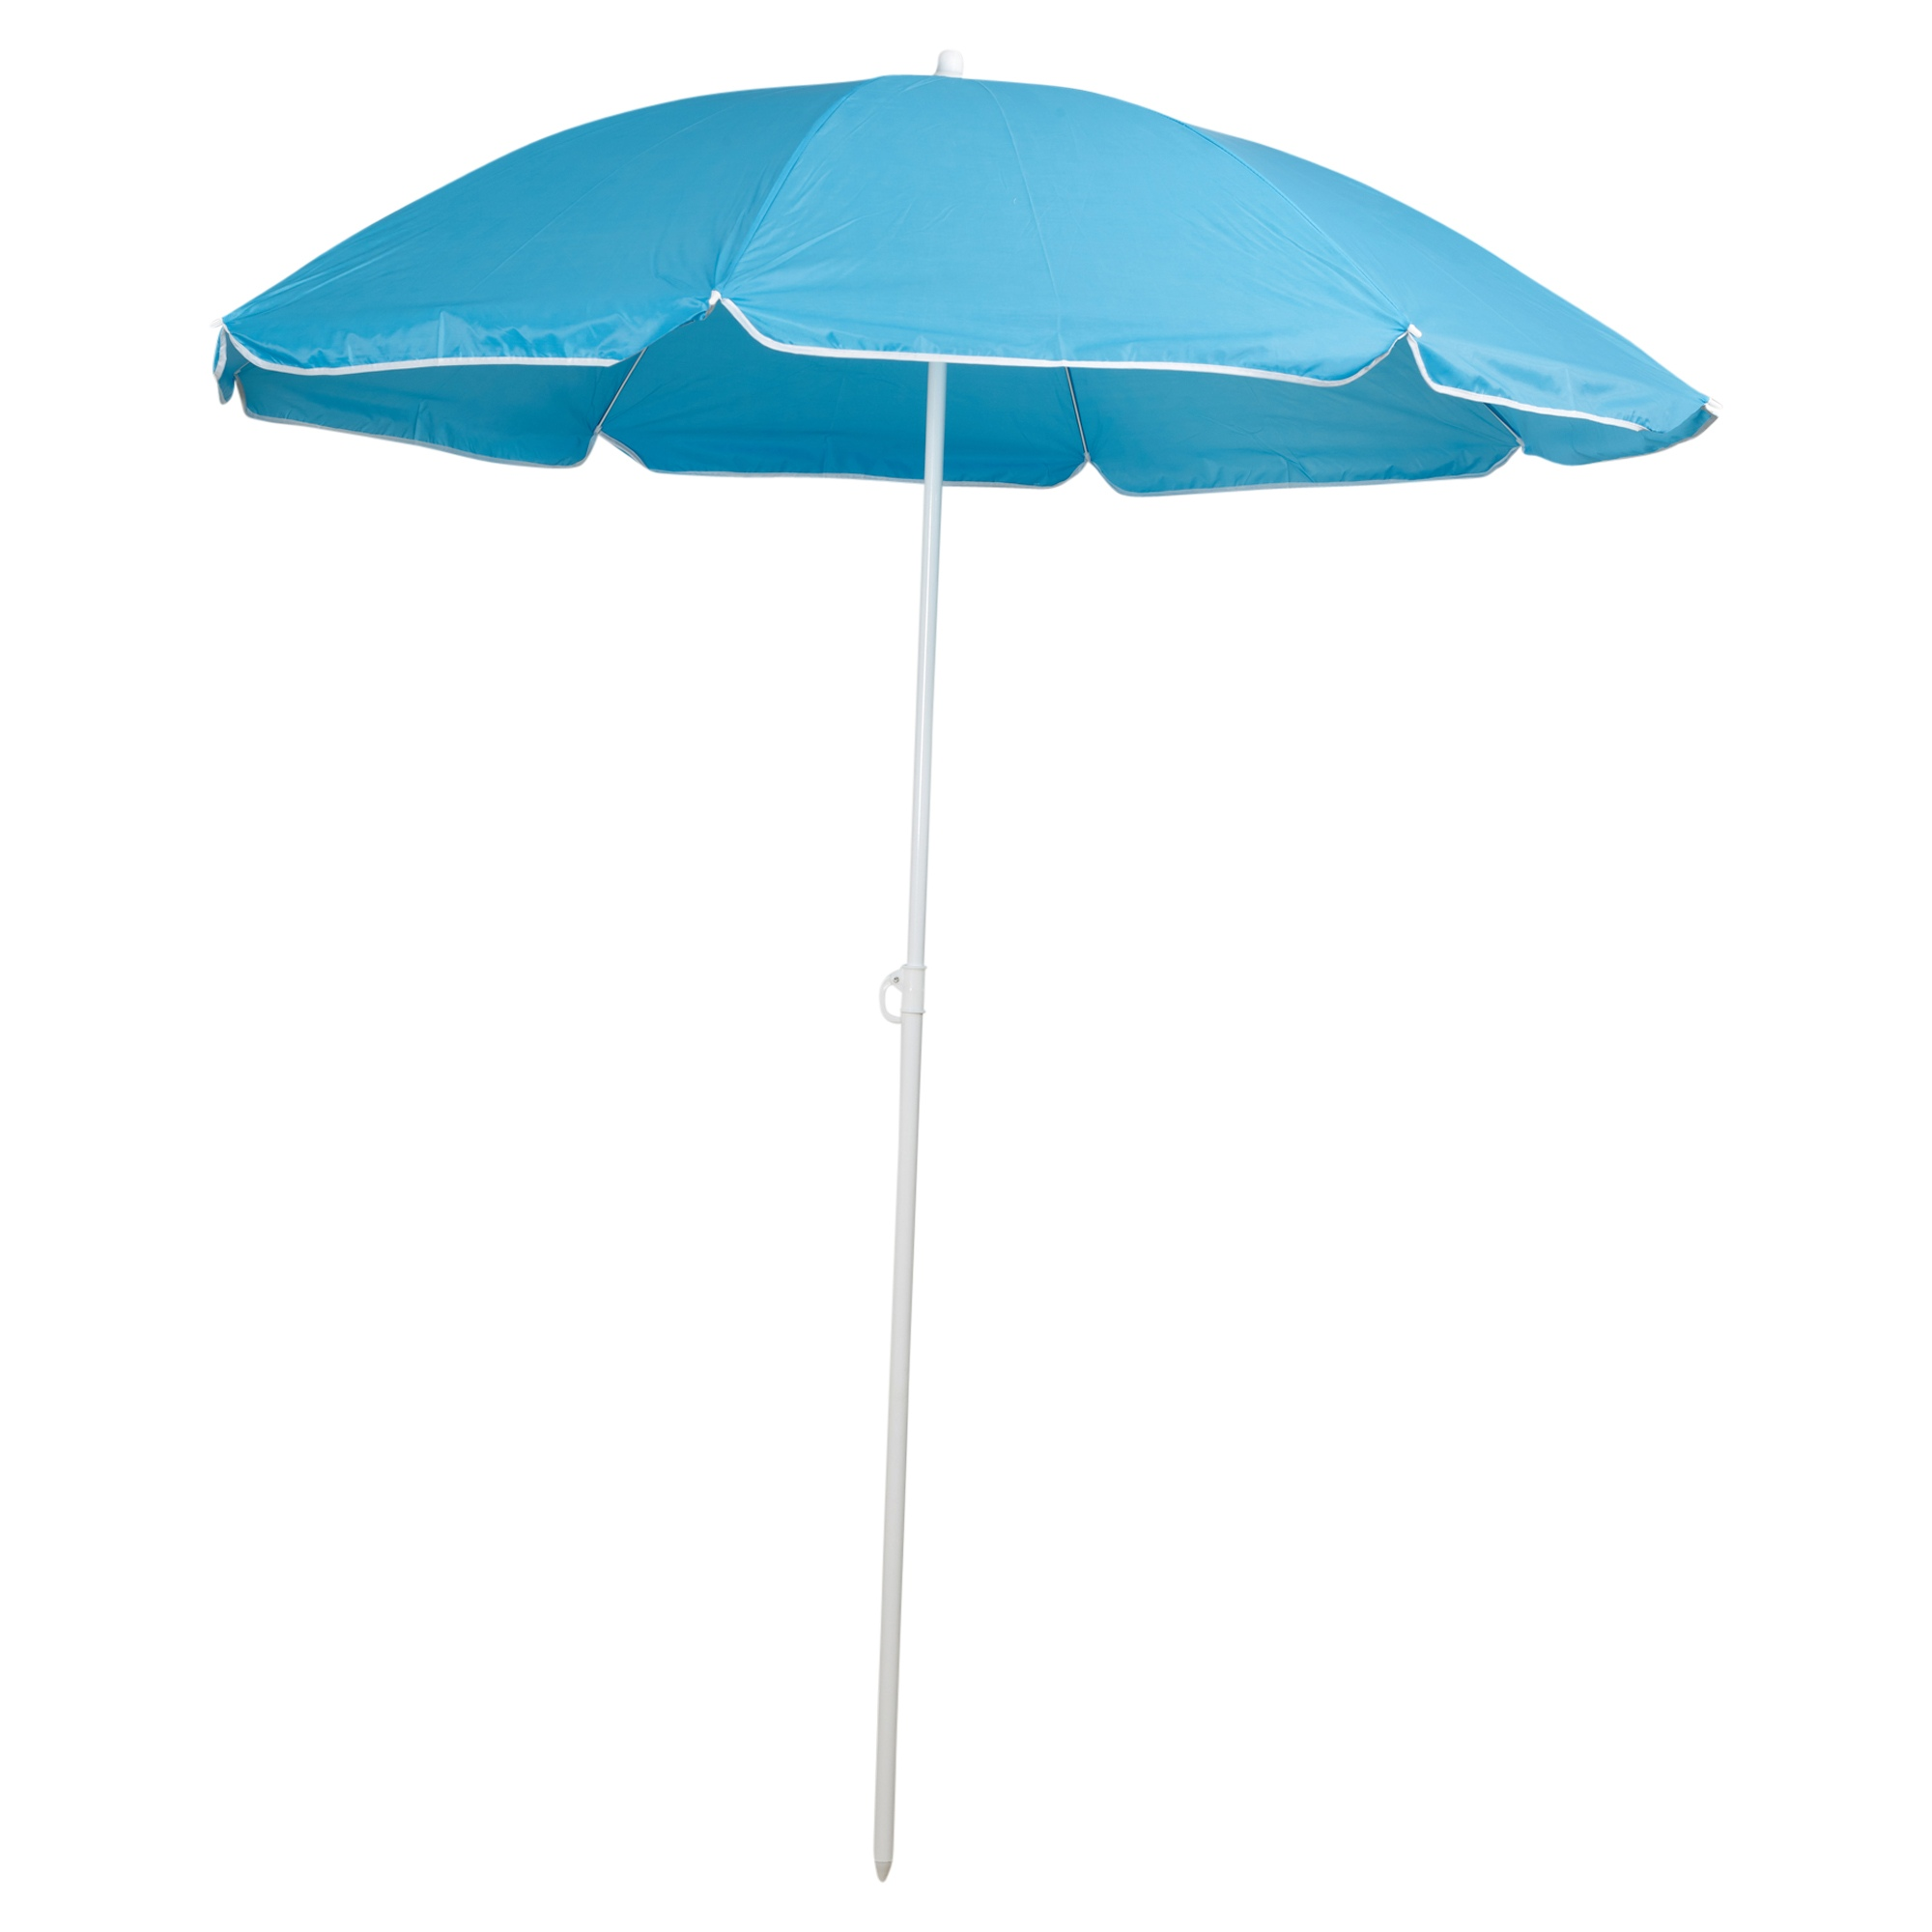 garden beach deck chair parasol umbrella sunshade spike. Black Bedroom Furniture Sets. Home Design Ideas